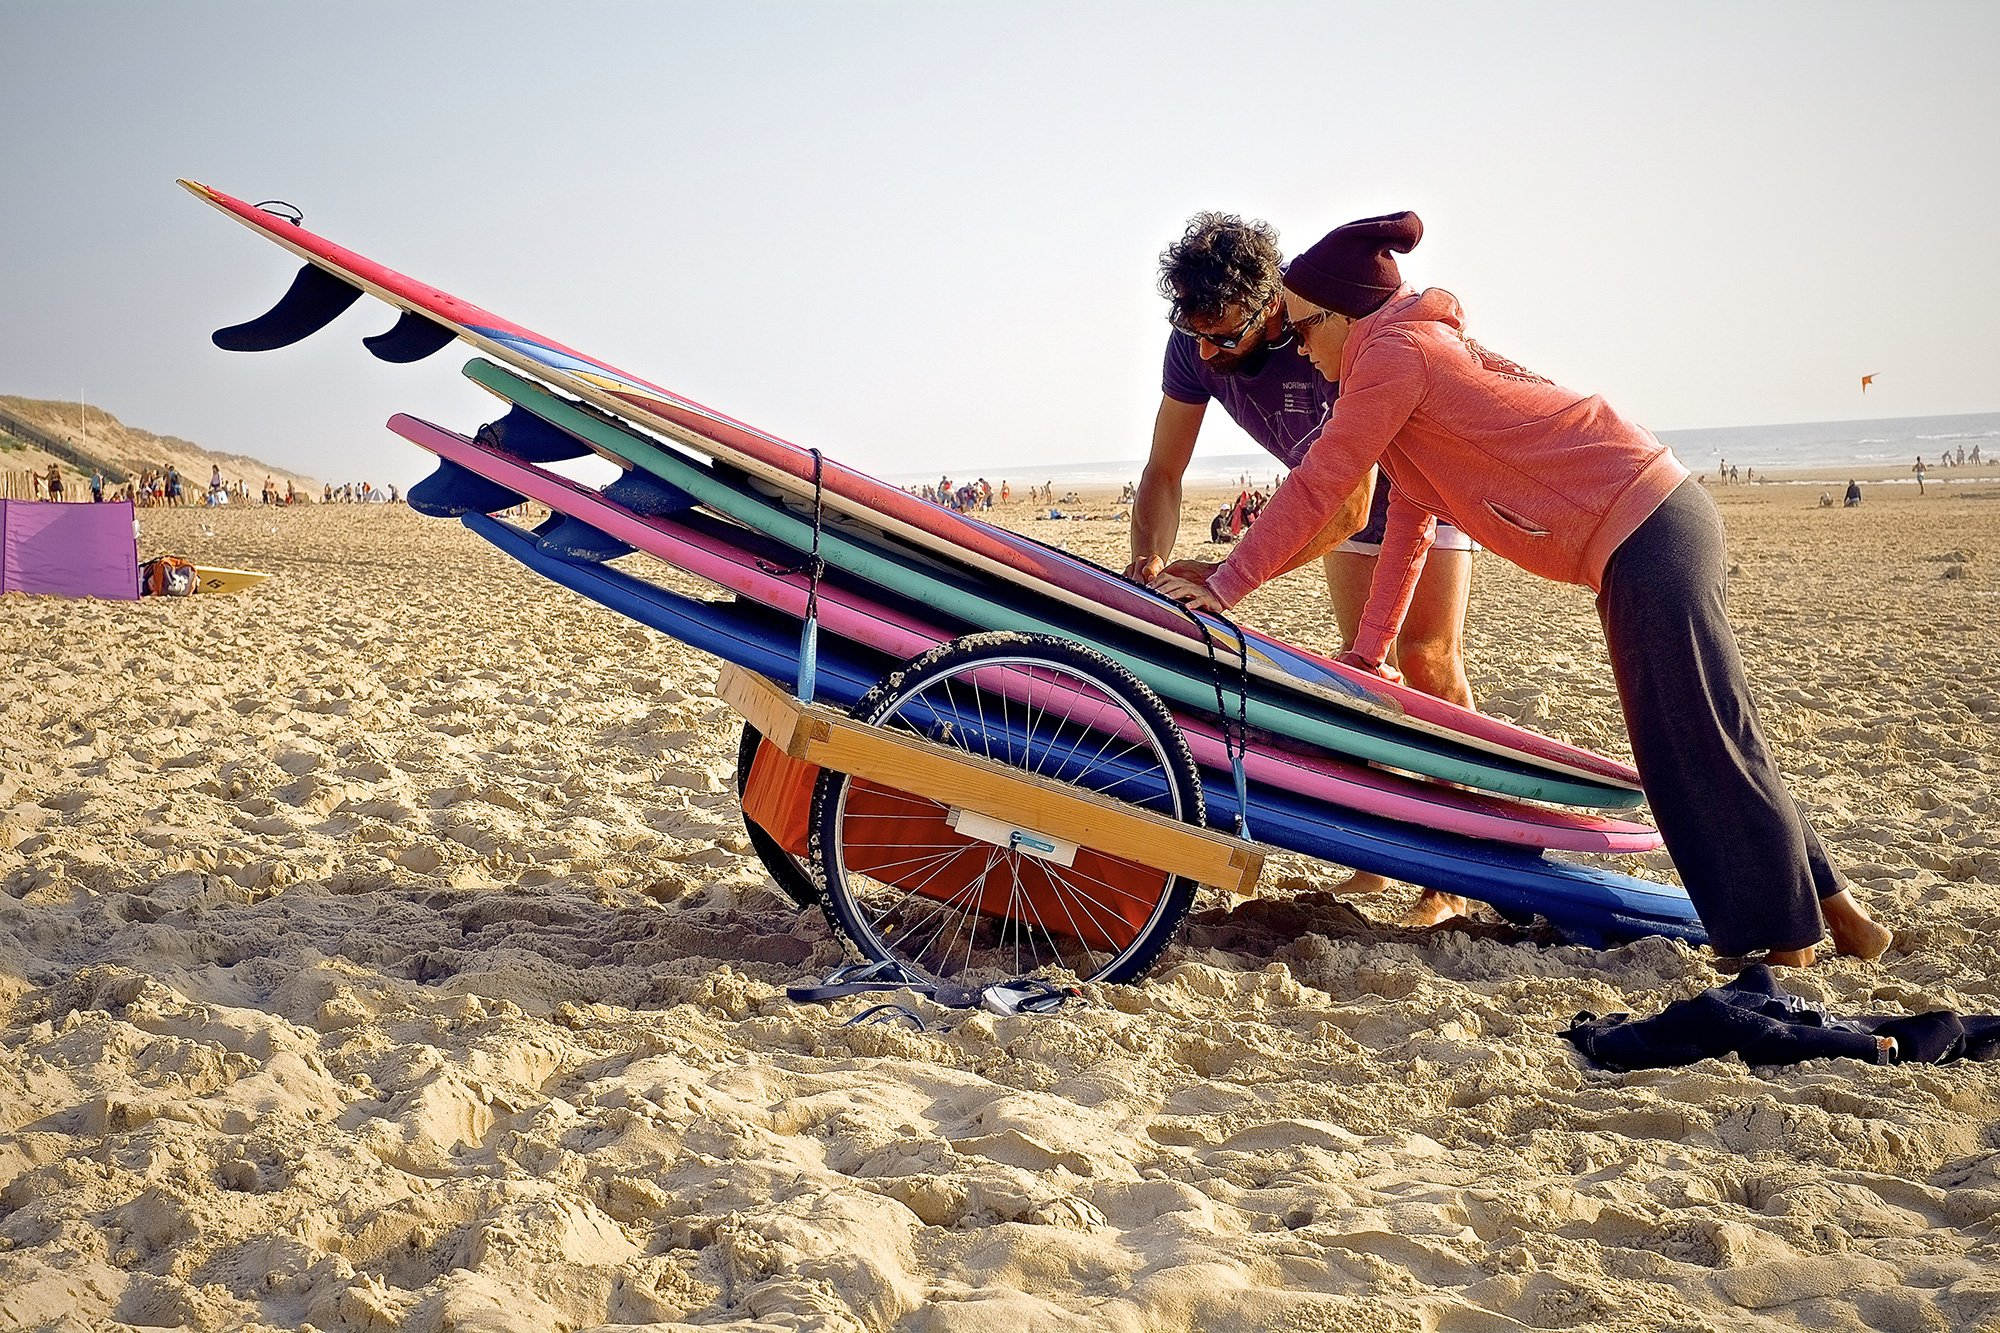 Reacha beach 24 in action